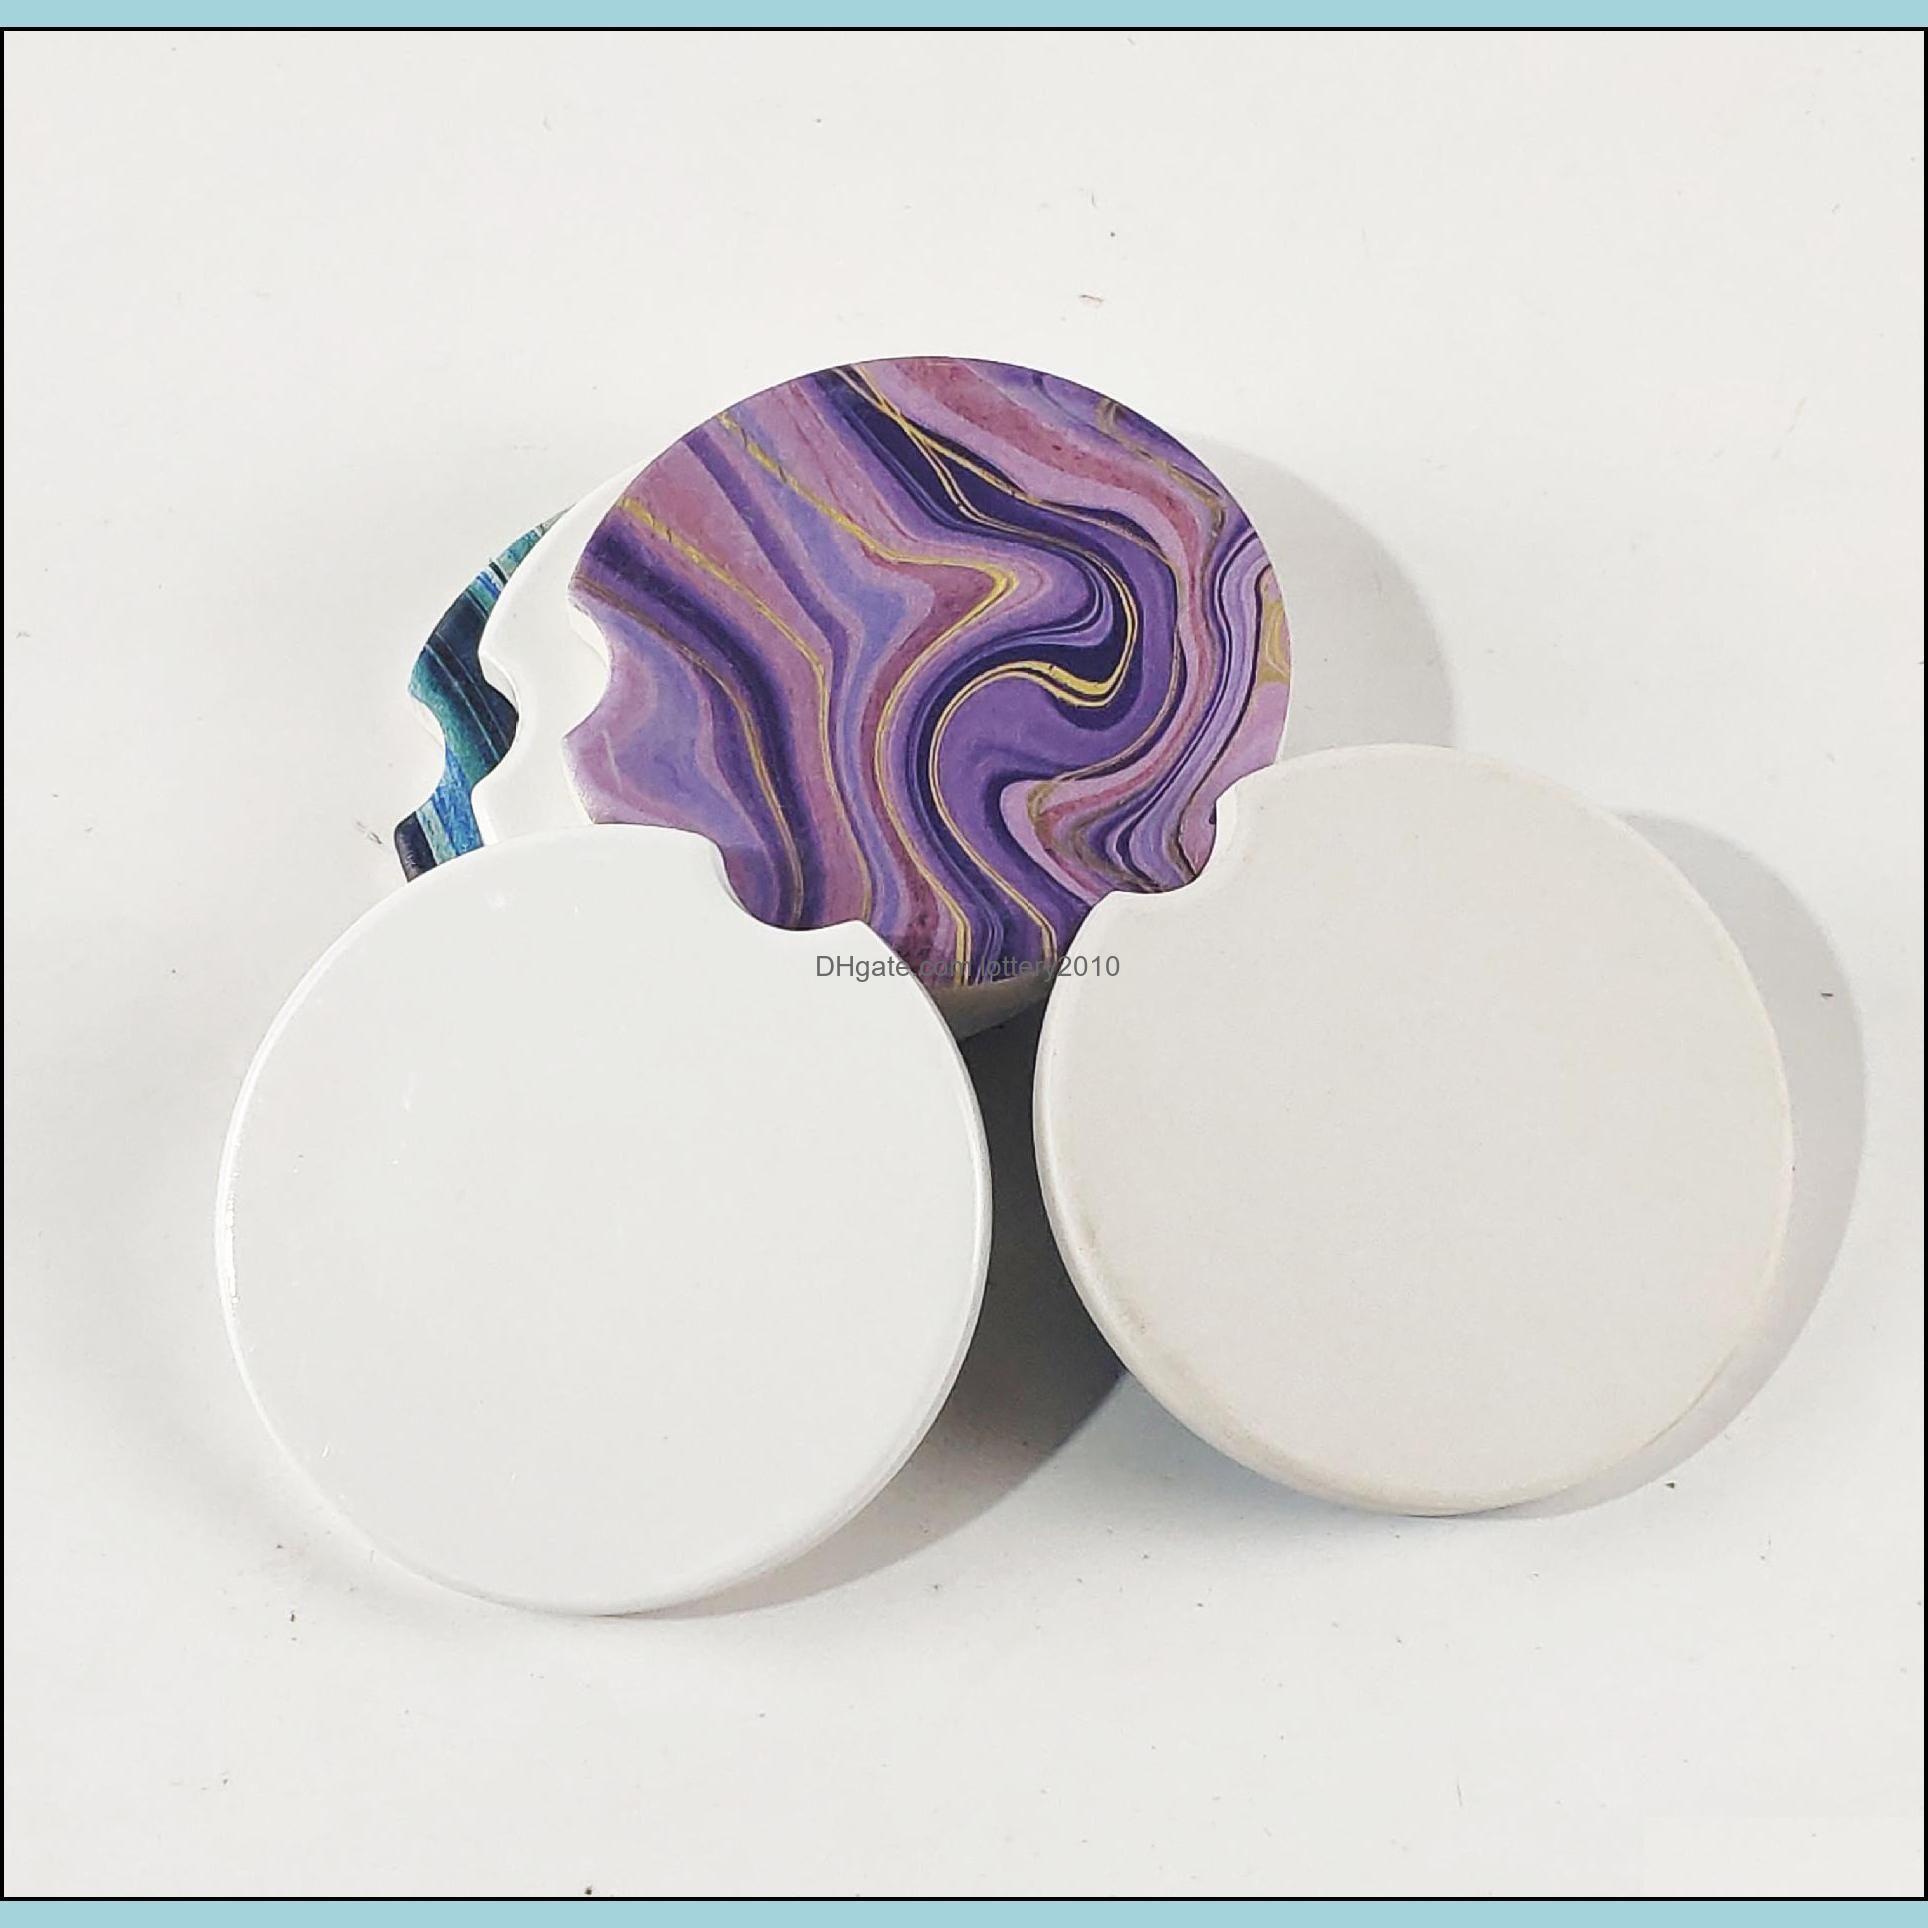 6.6*6.6cm Sublimation Blank Car Ceramics Coasters Cup Mats ZZA3322